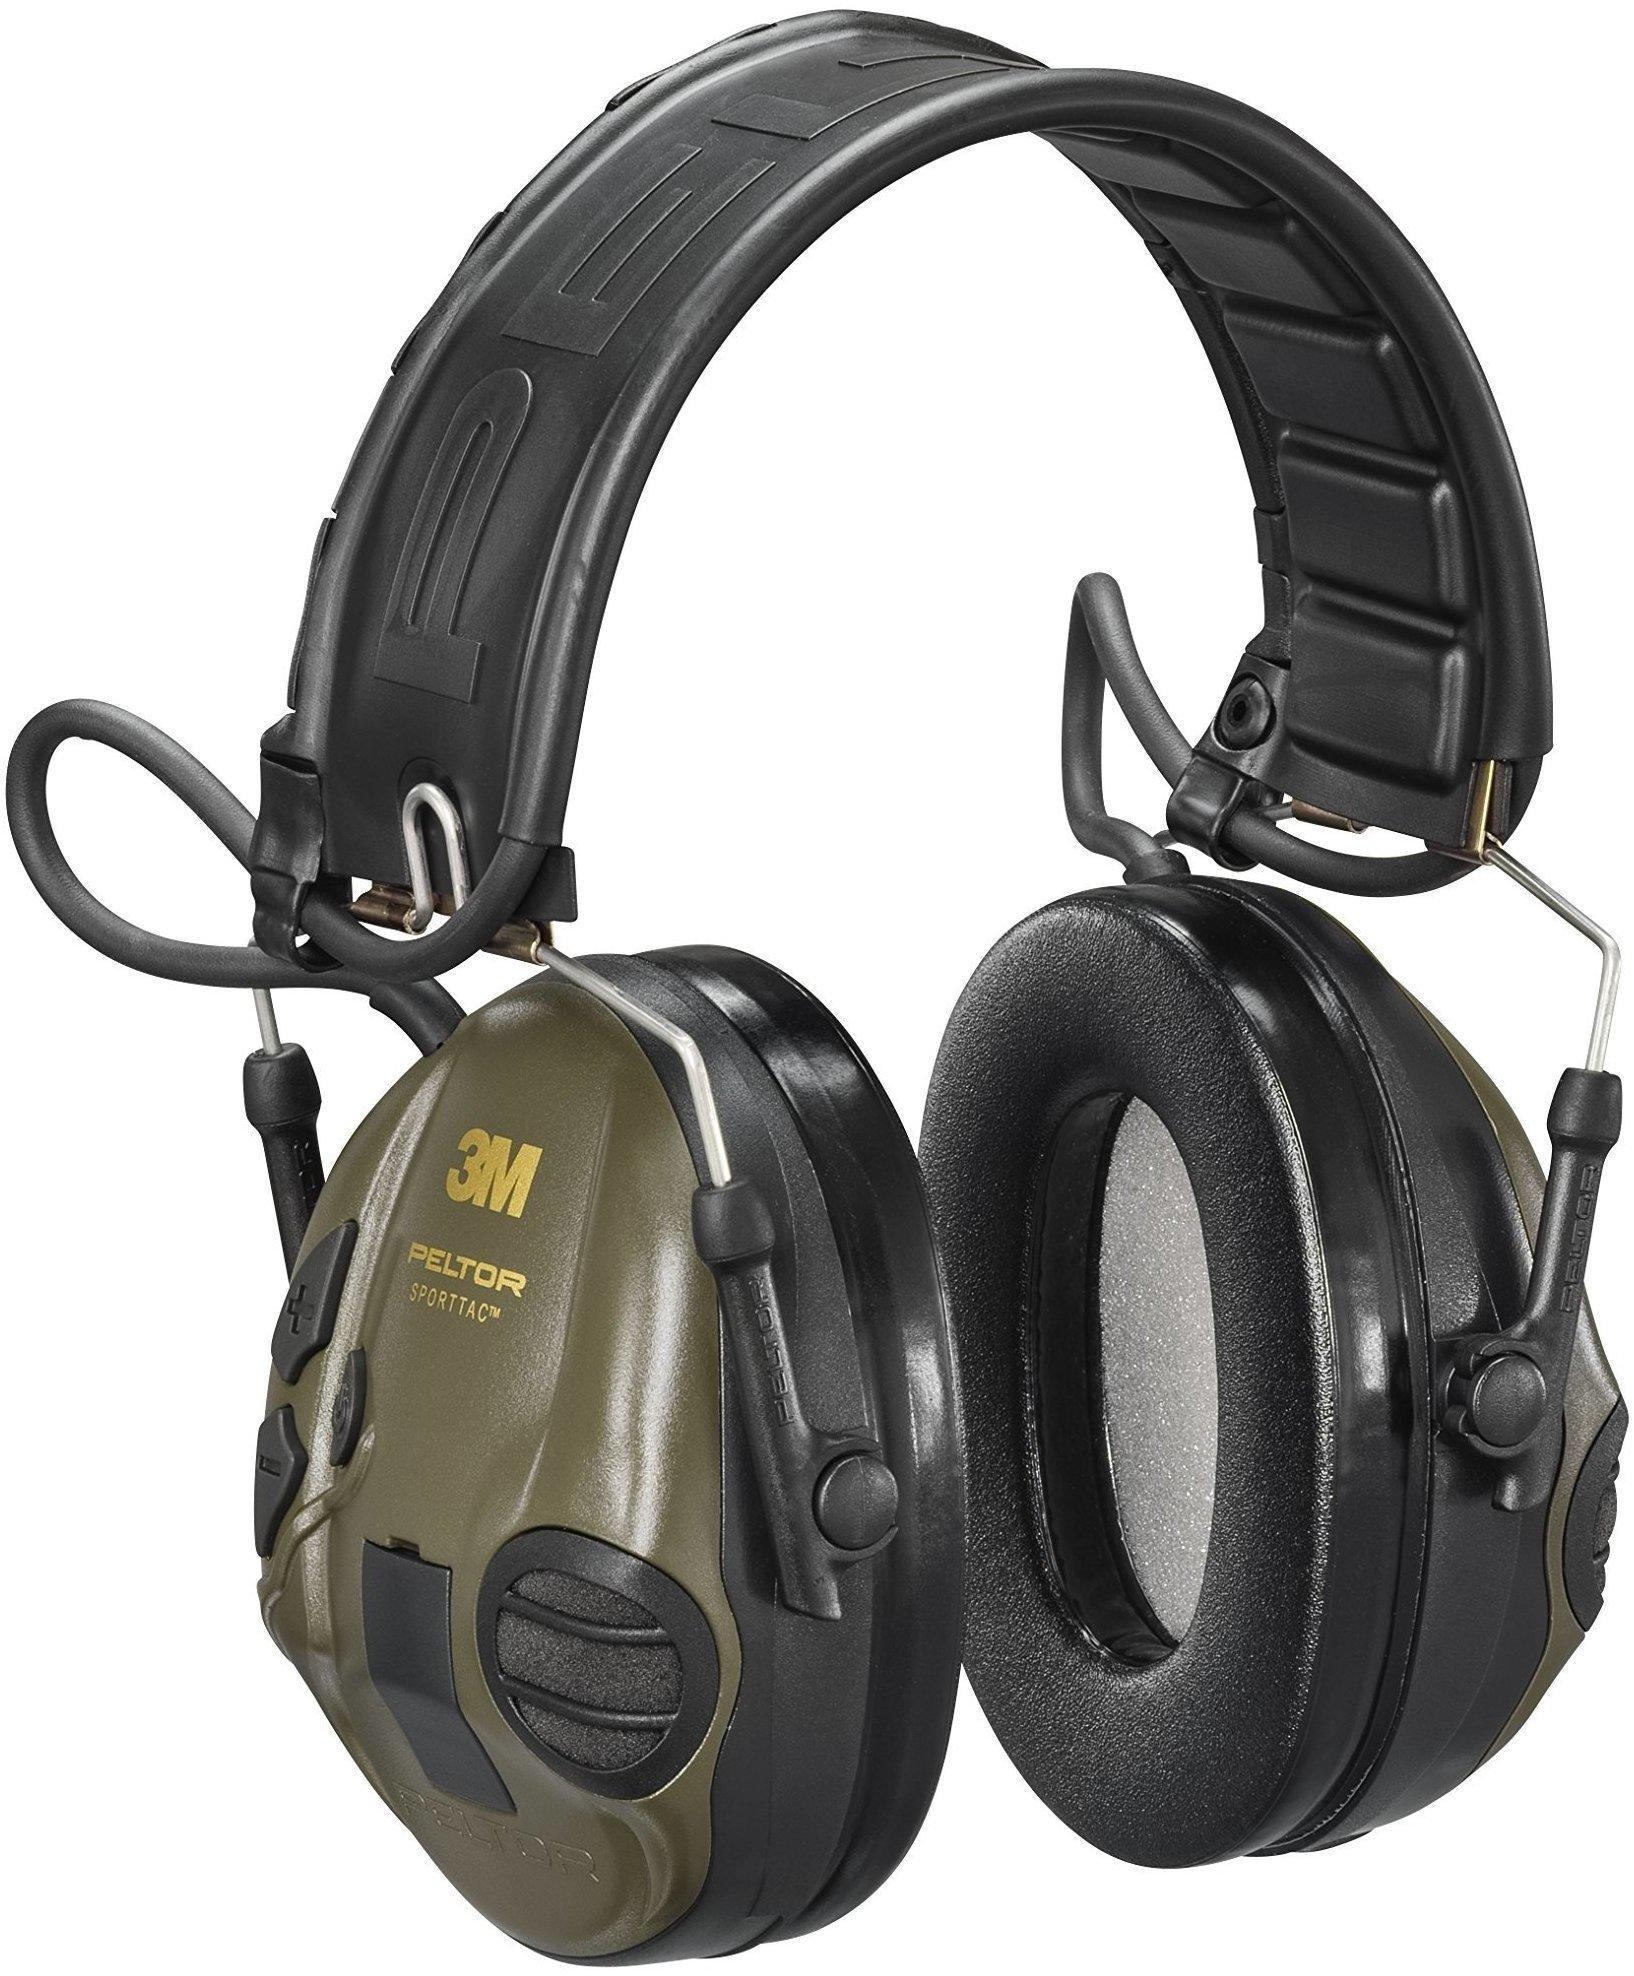 3m peltor sporttac aktiver gehörschutz mit faltbügel, grün/orange